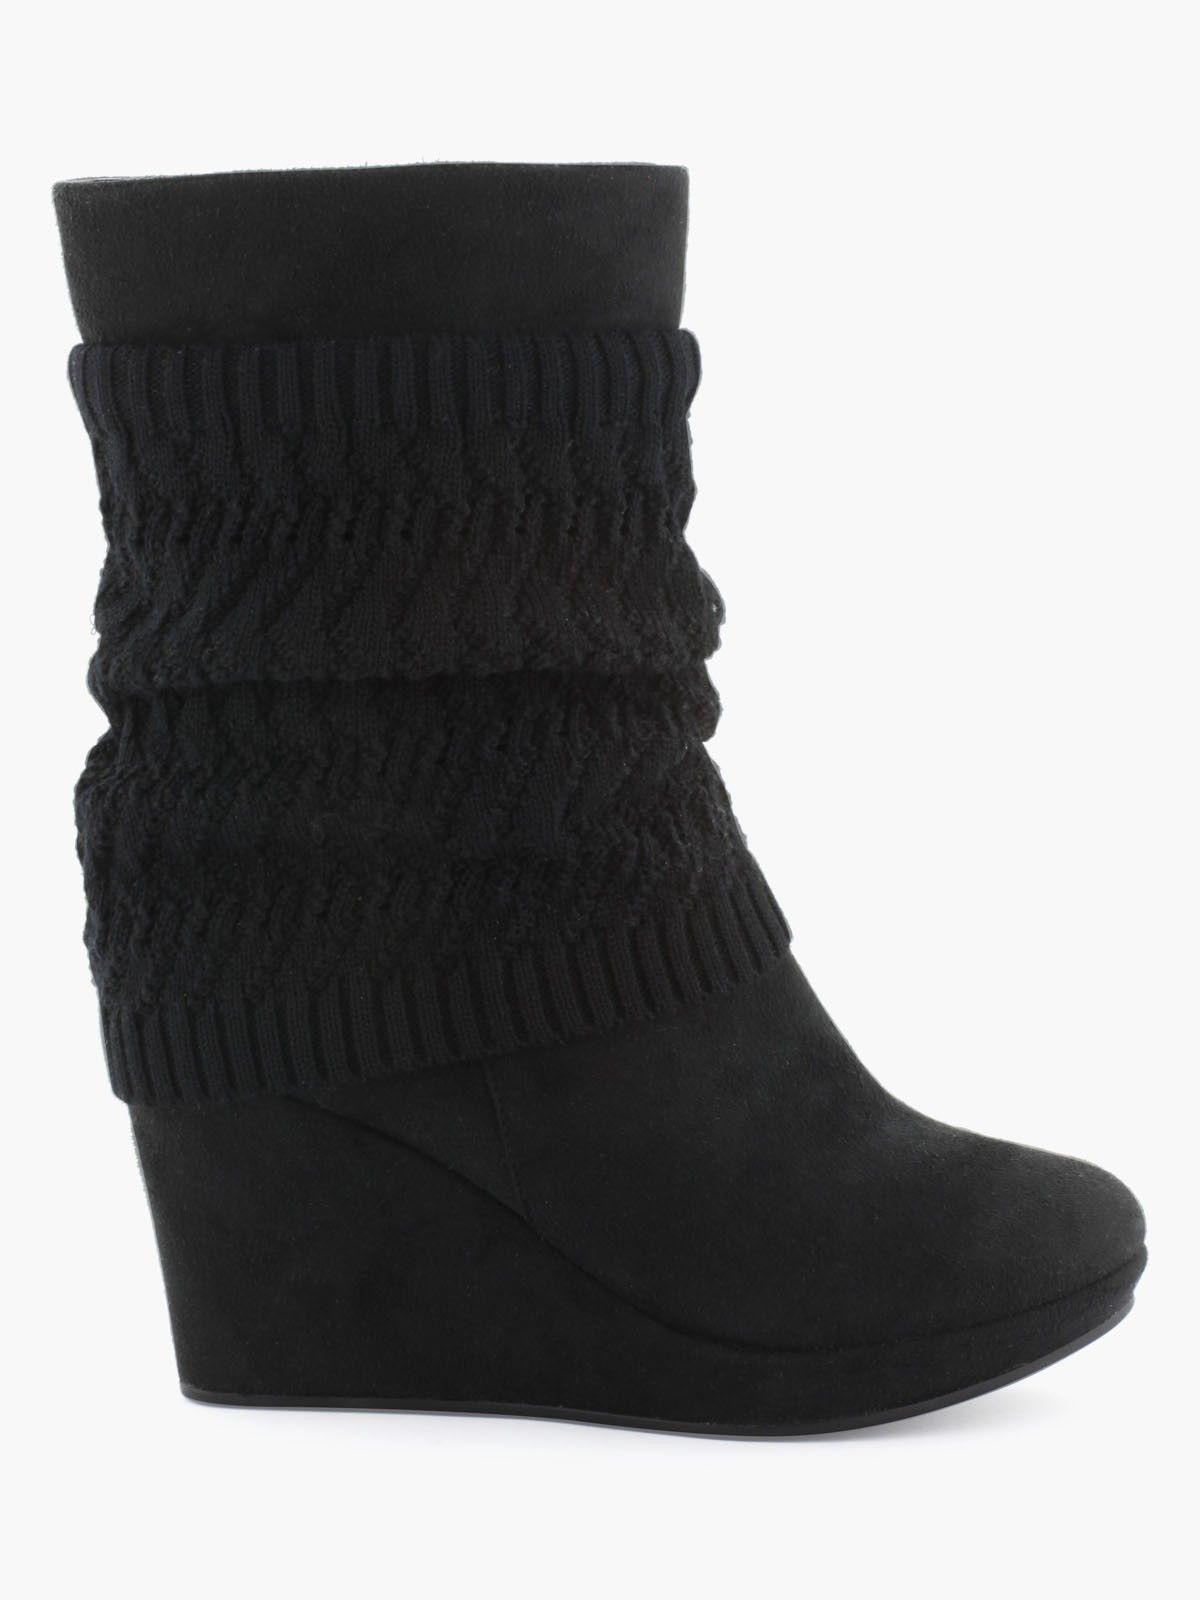 HALLE bootsShoes Boots CHAUSSURESChaussuresShoe et LA SUMpLGqzVj